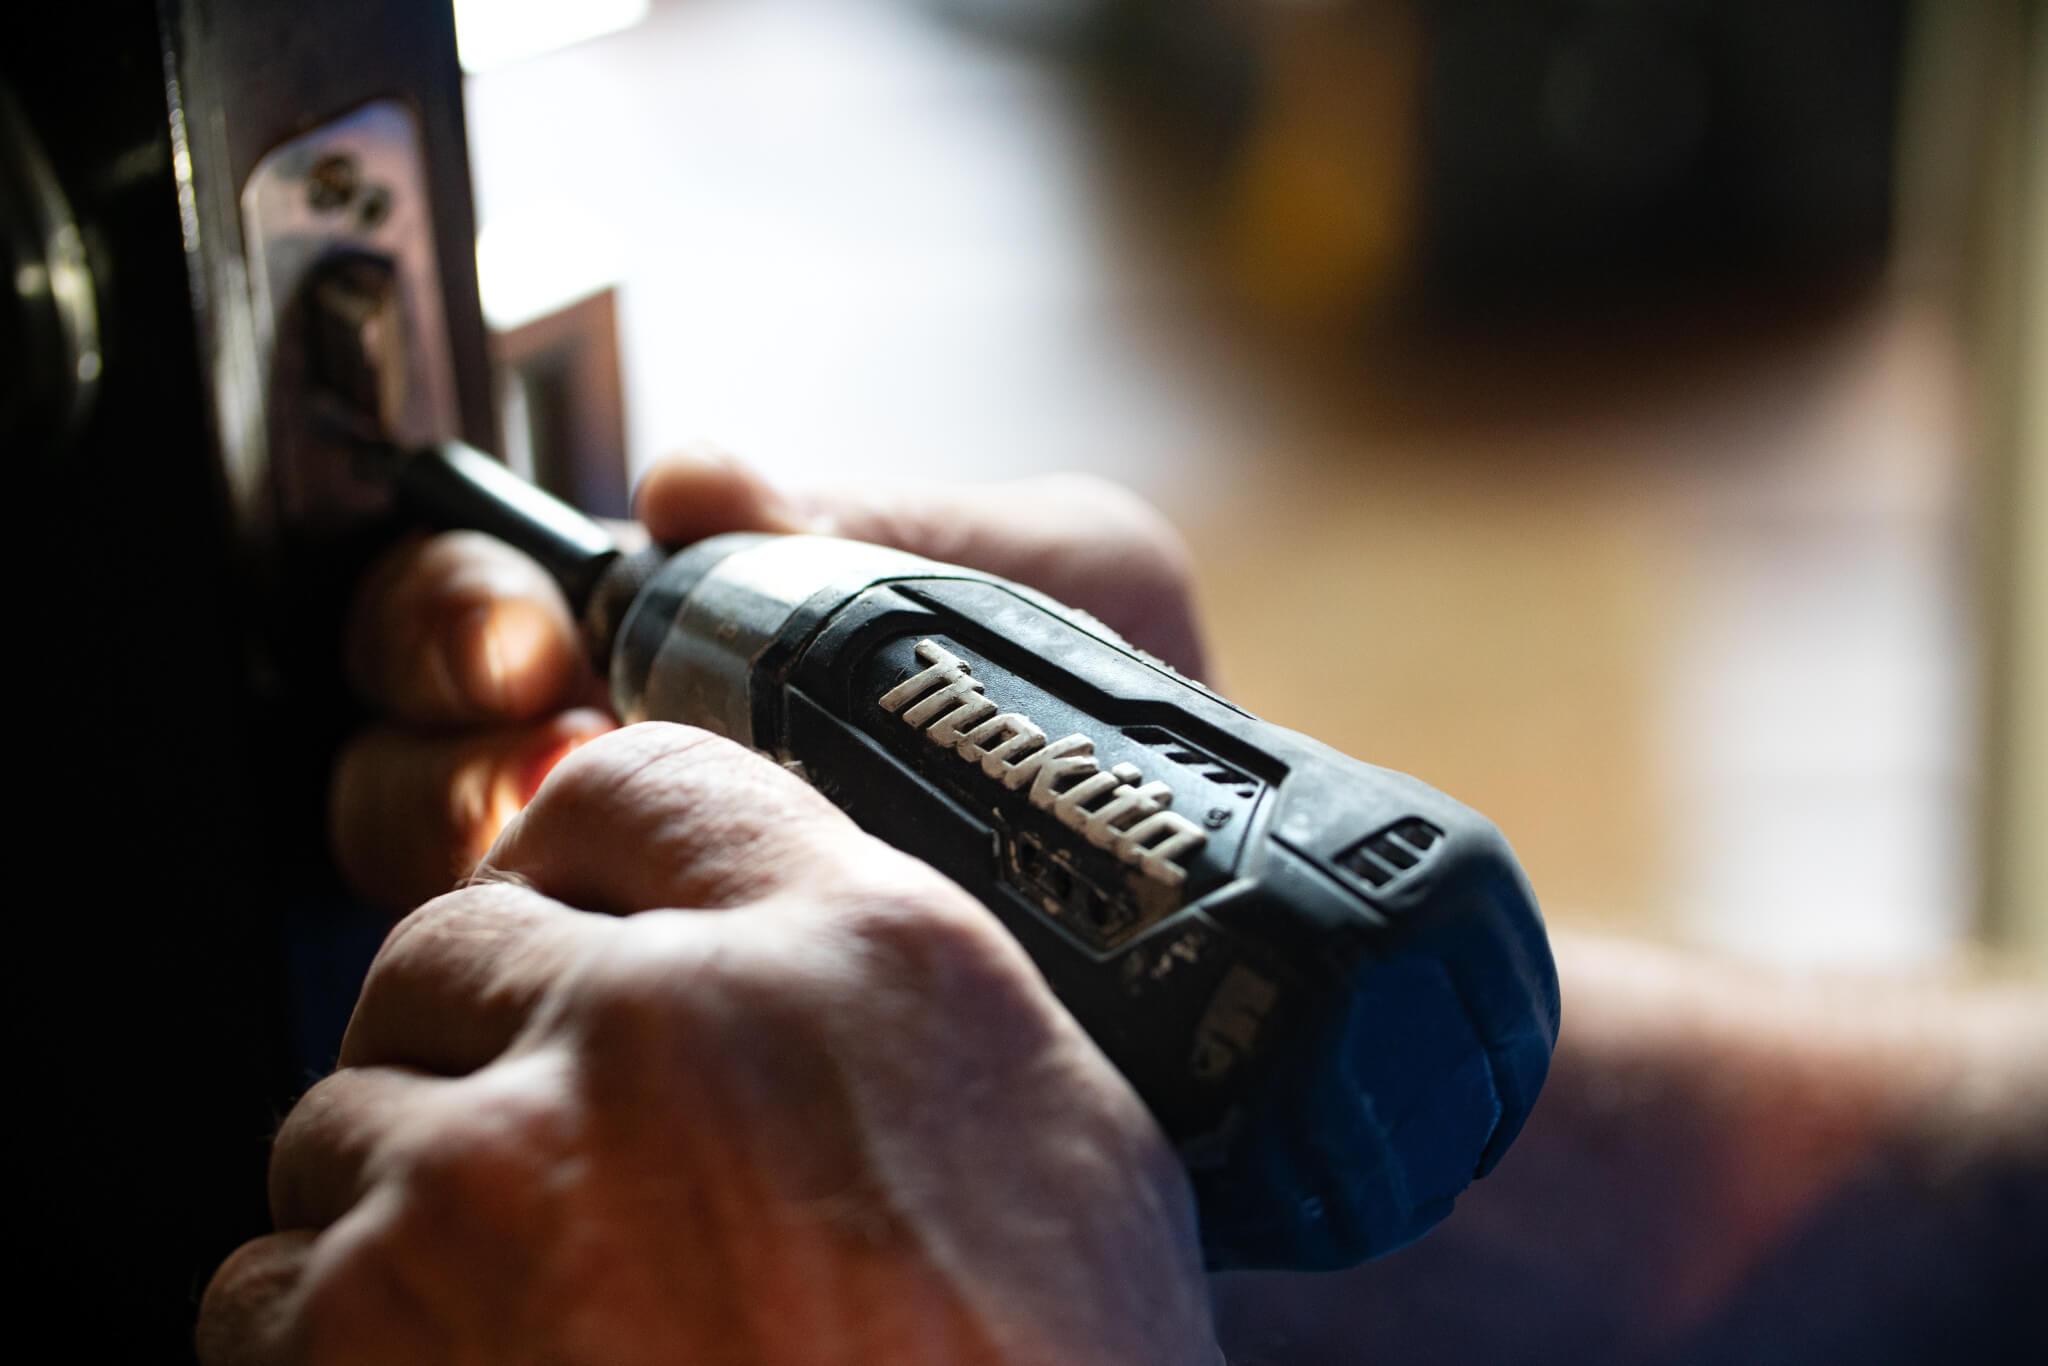 hand using power drill on door latch